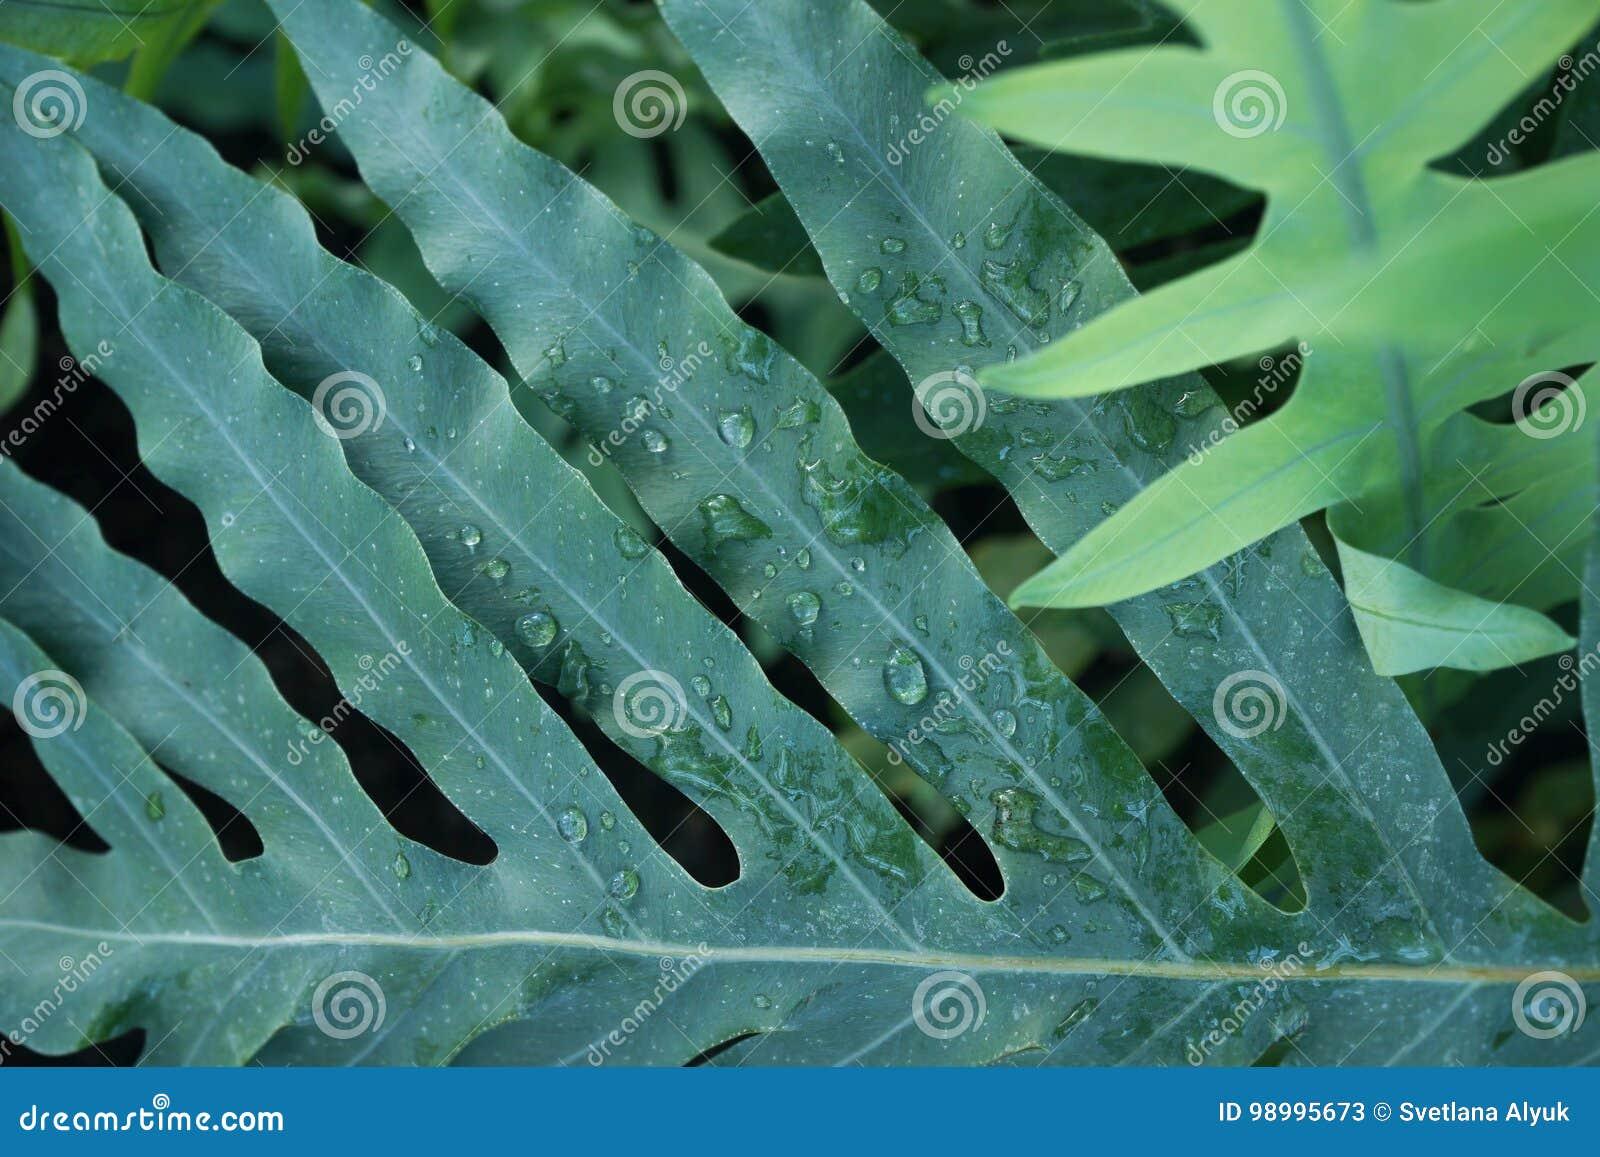 Fondo del follaje del verde de la planta tropical